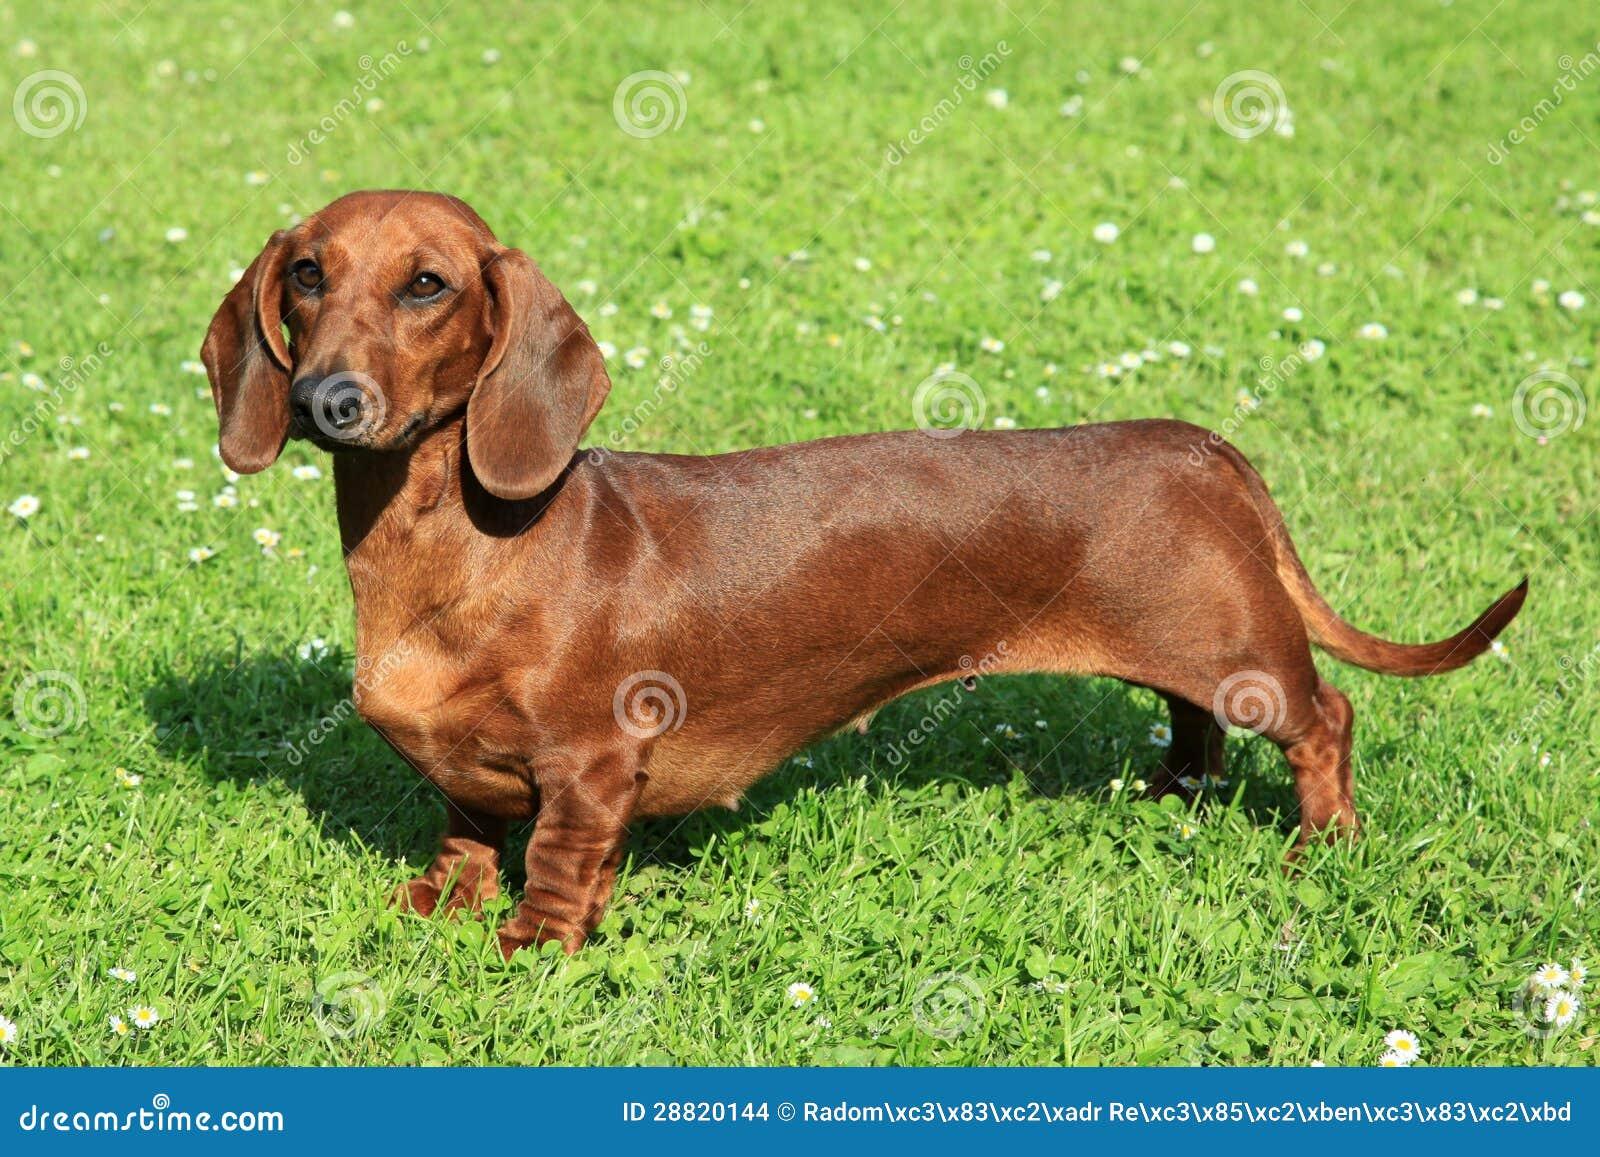 Wiener Dog Review